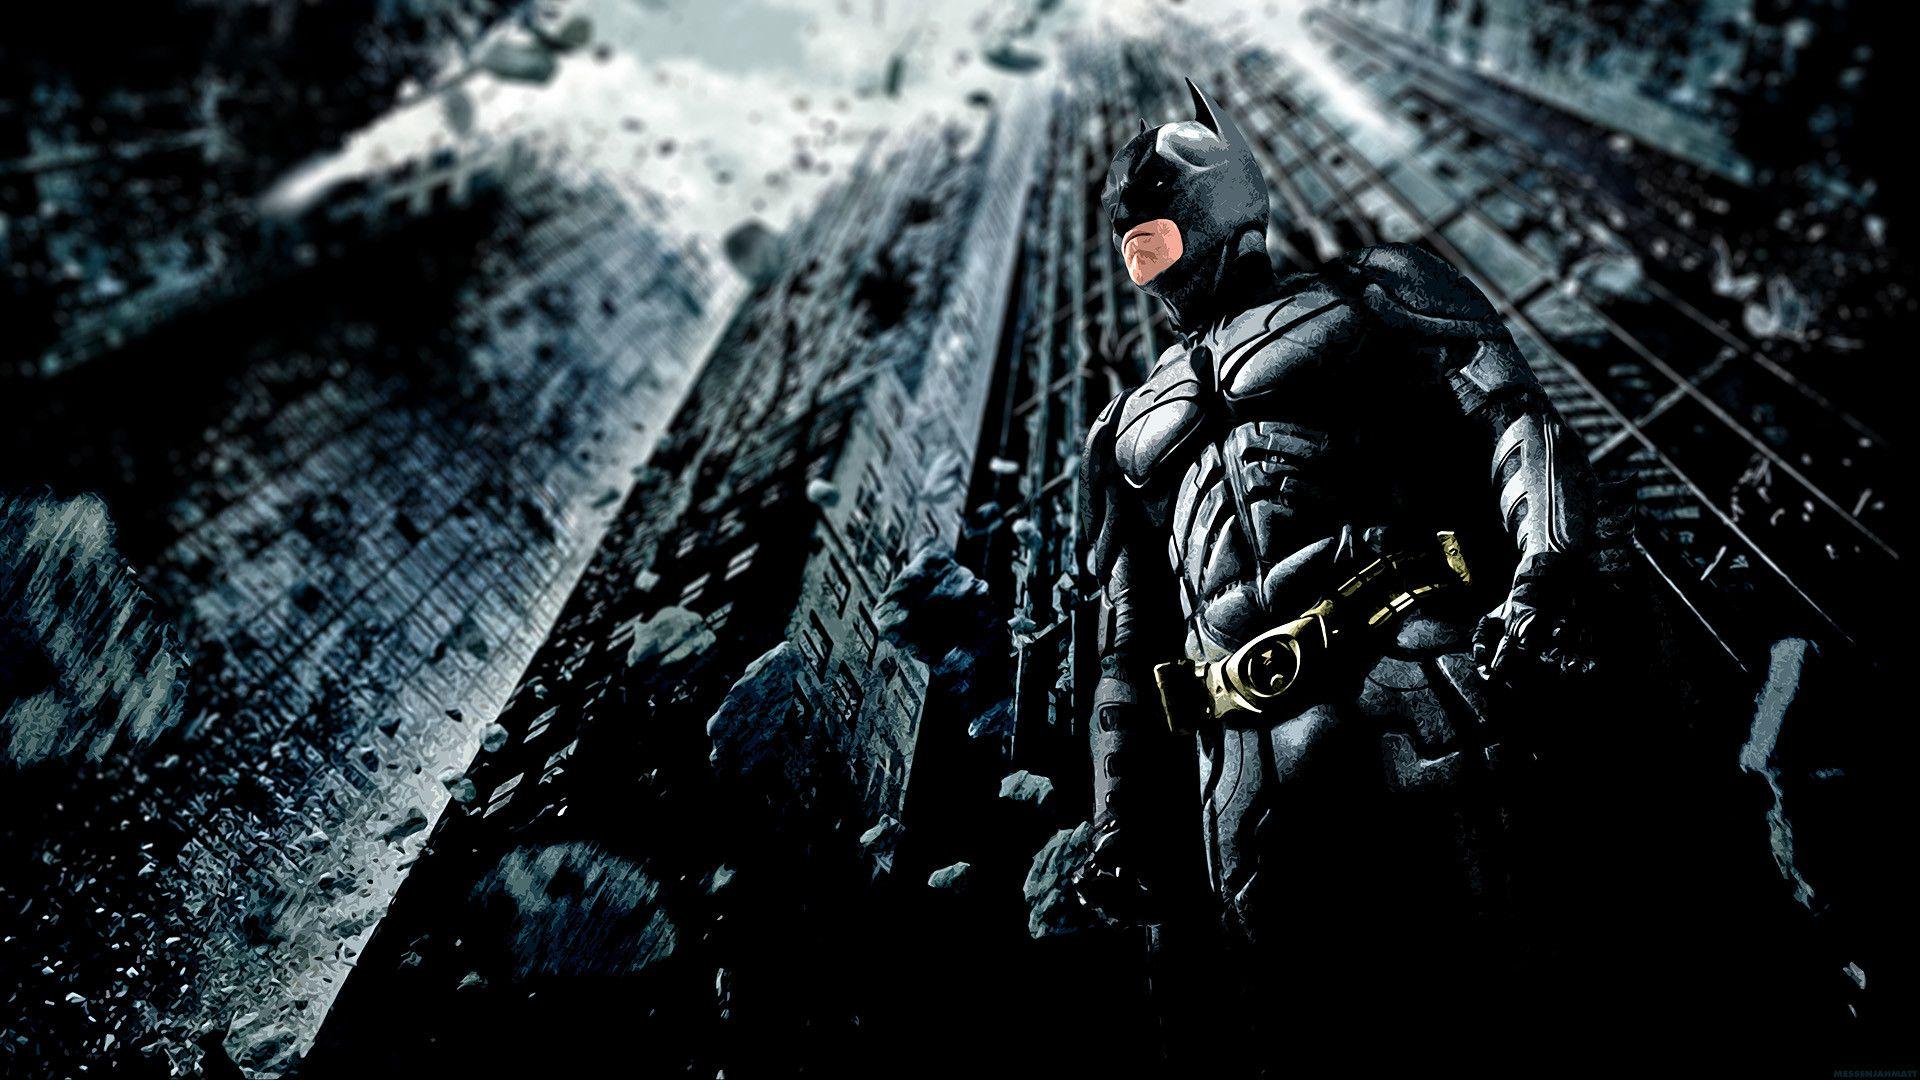 Bat Man Wallpaper Dark Knight Wallpaper The Dark Knight Rises Batman The Dark Knight Batman dark knight wallpaper hd 1080p